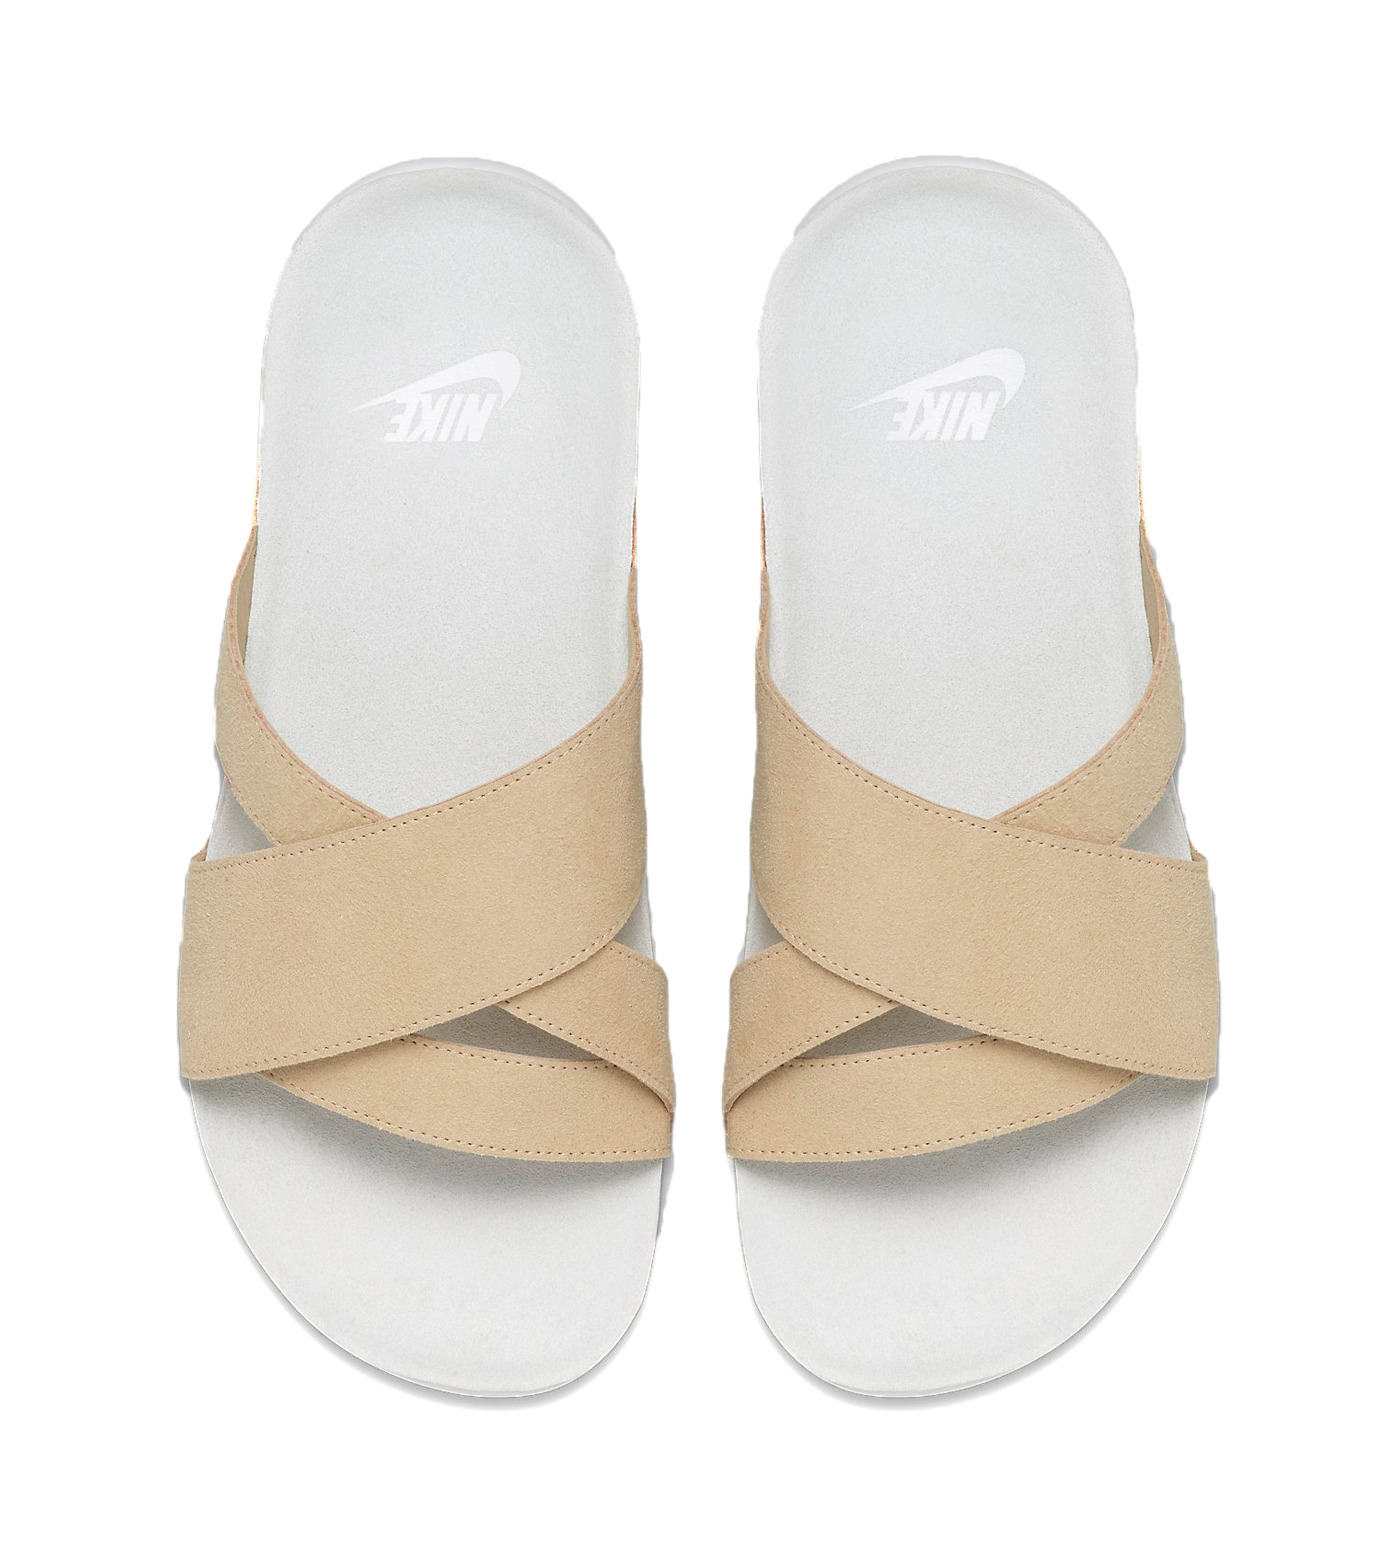 NIKE(ナイキ)のTAUPO-BEIGE(シューズ/shoes)-849756-210-52 拡大詳細画像4